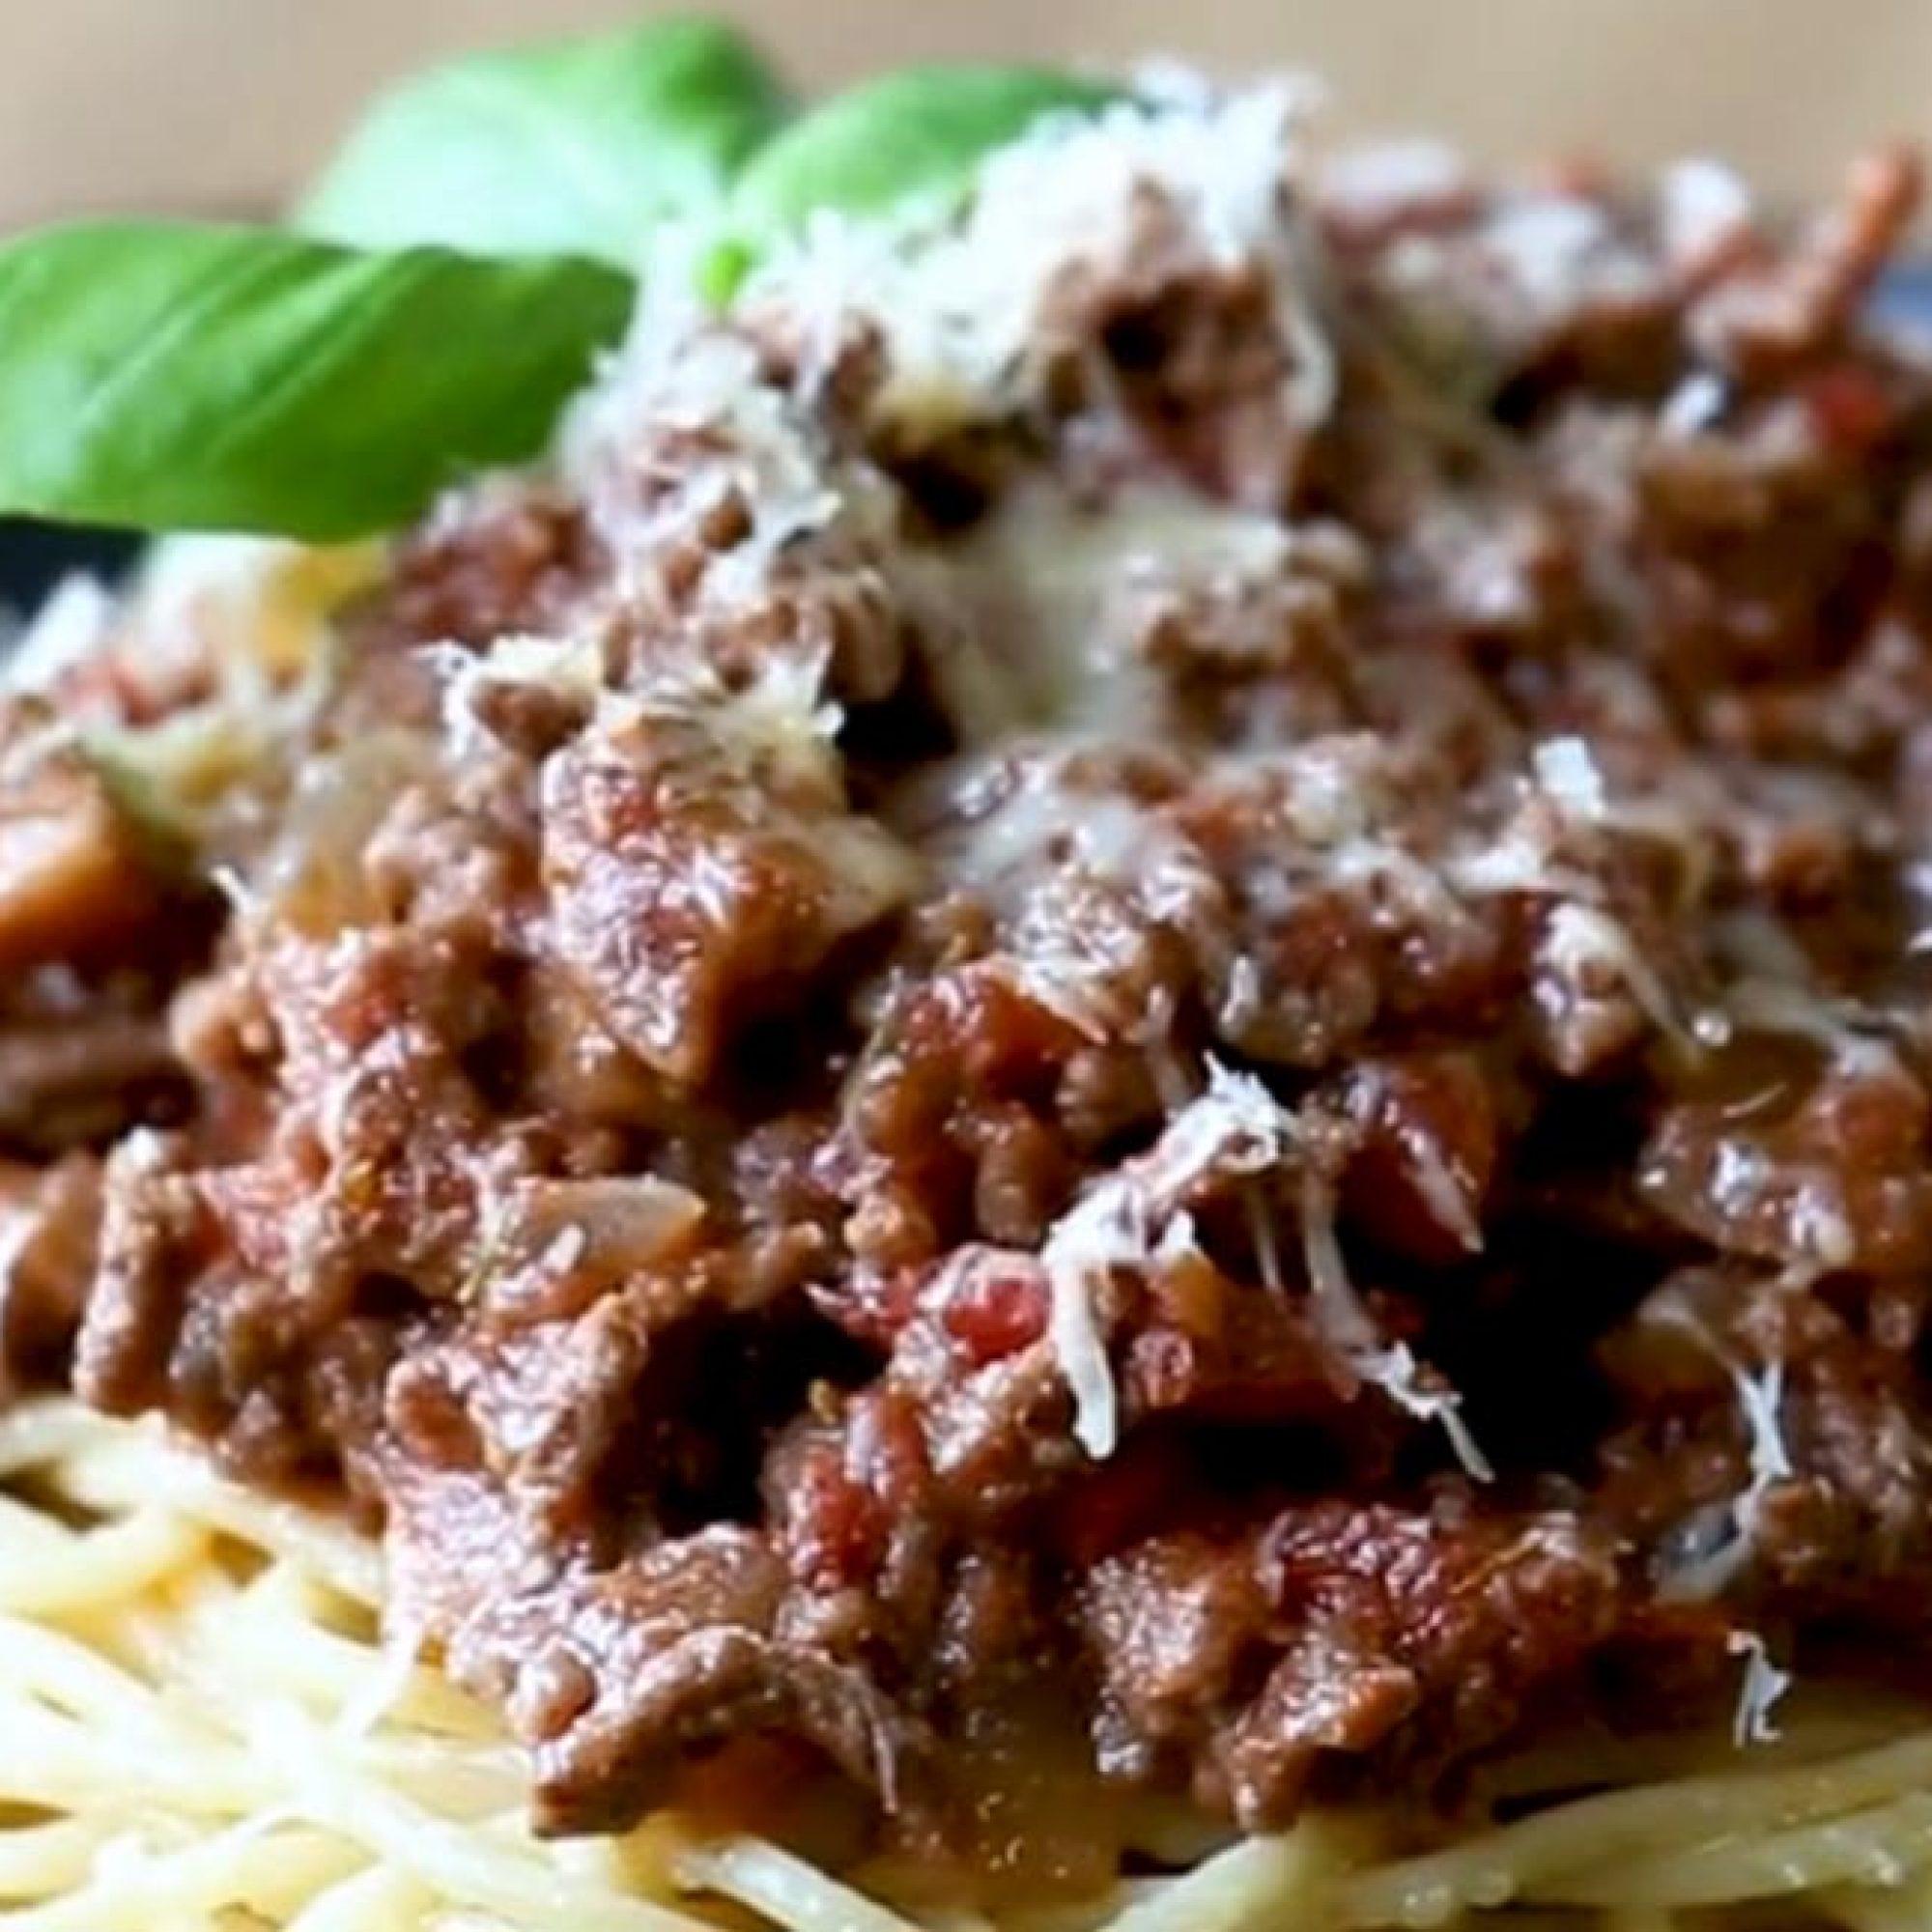 Saucy Spaghetti Bolognese